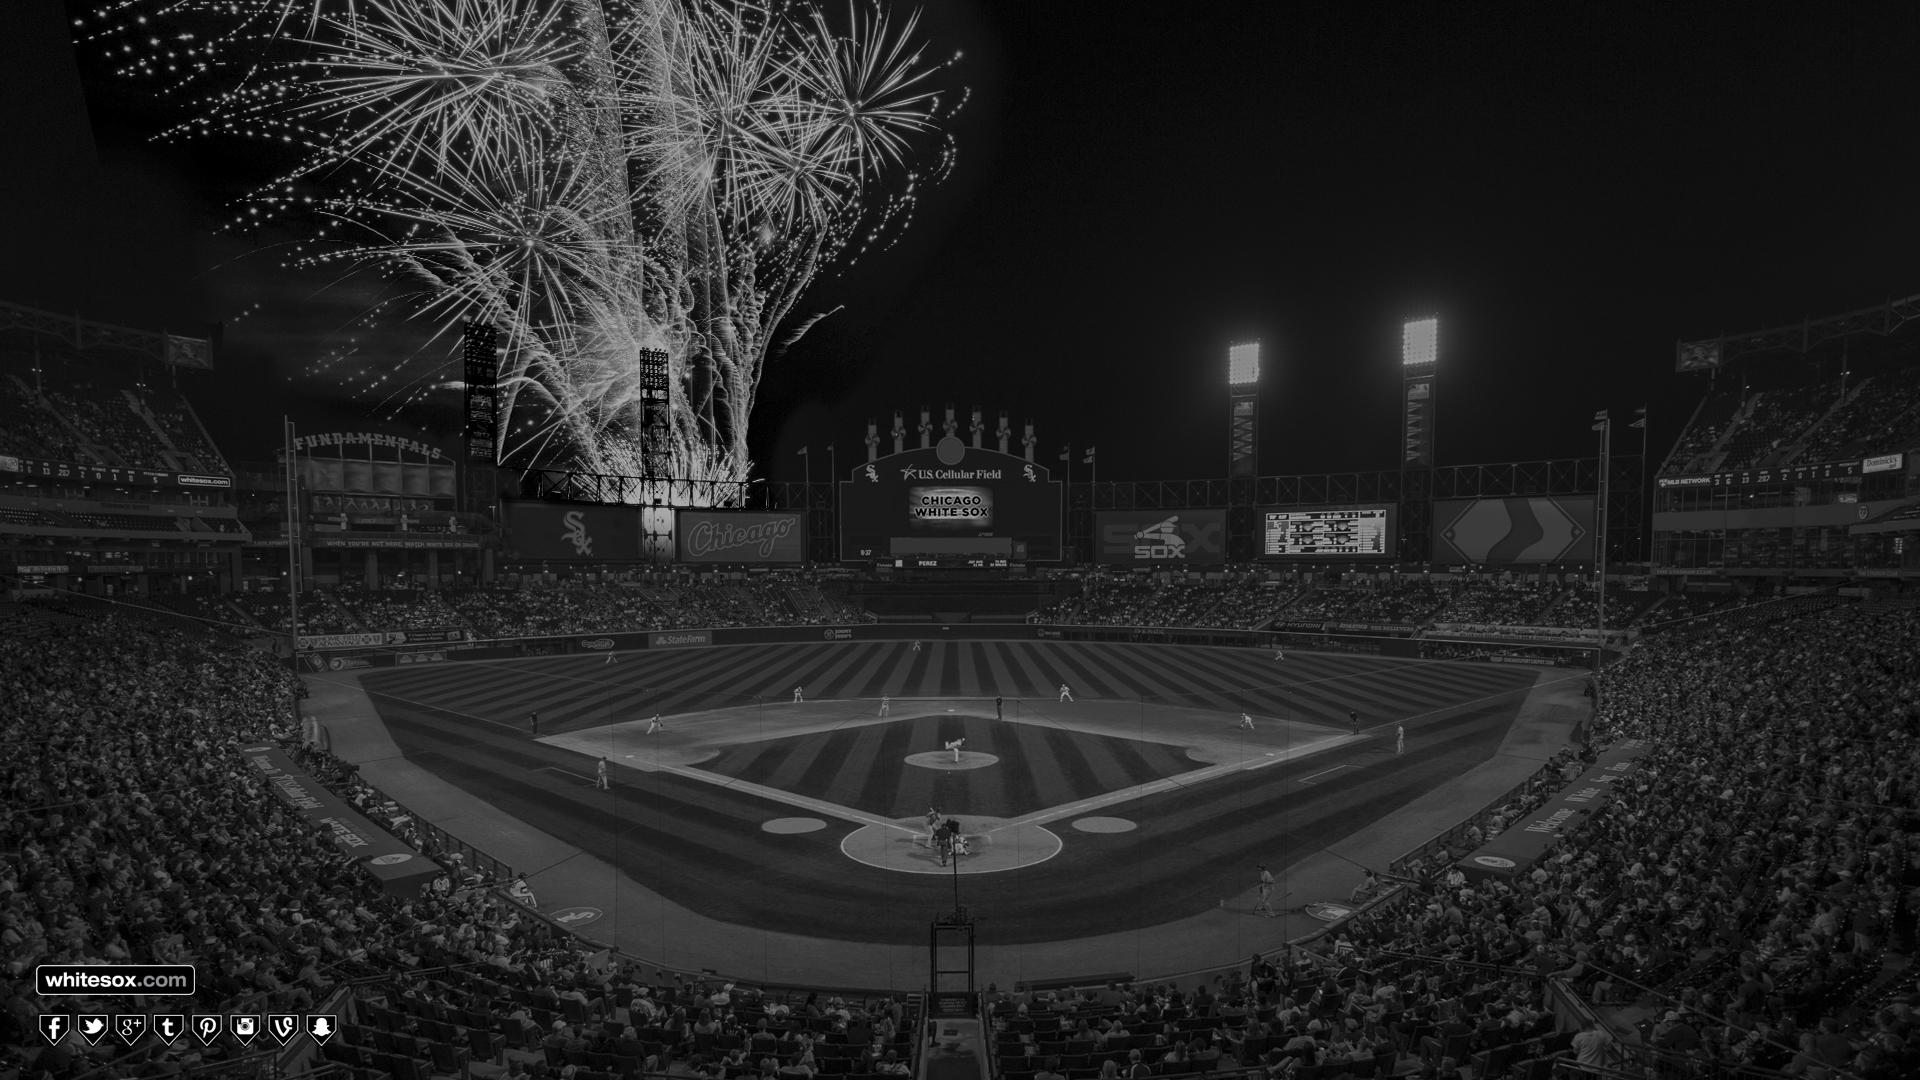 Best 46 White Sox Desktop Backgrounds on HipWallpaper Chicago 1920x1080